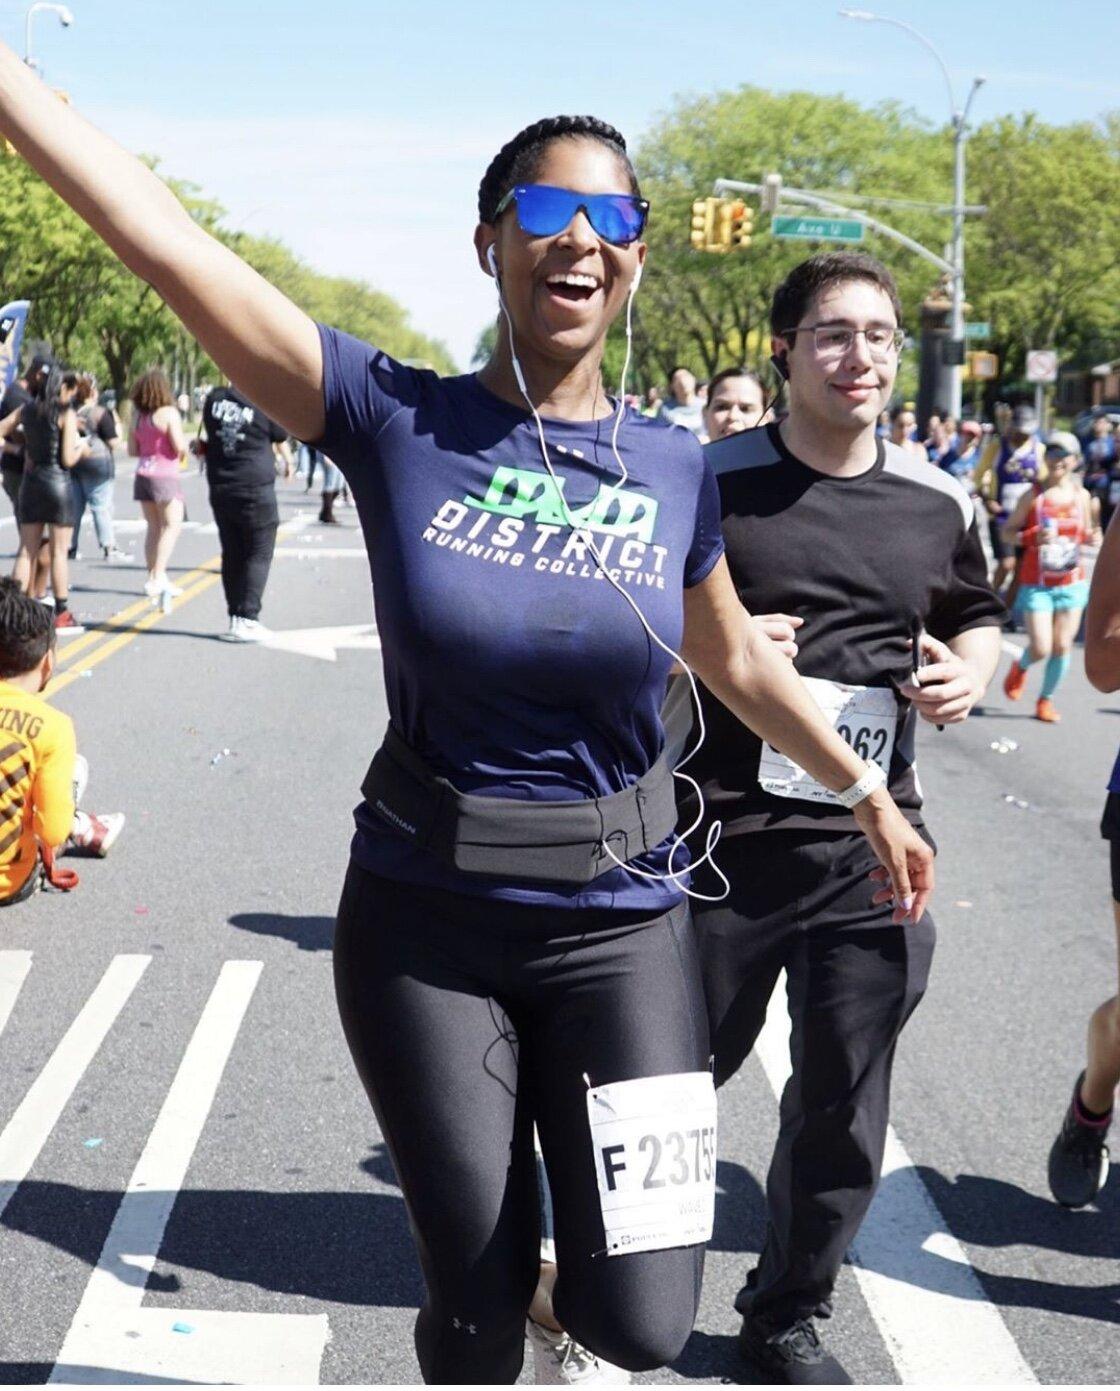 Natalie gets hype during the 2019 Popular Brooklyn Half Marathon